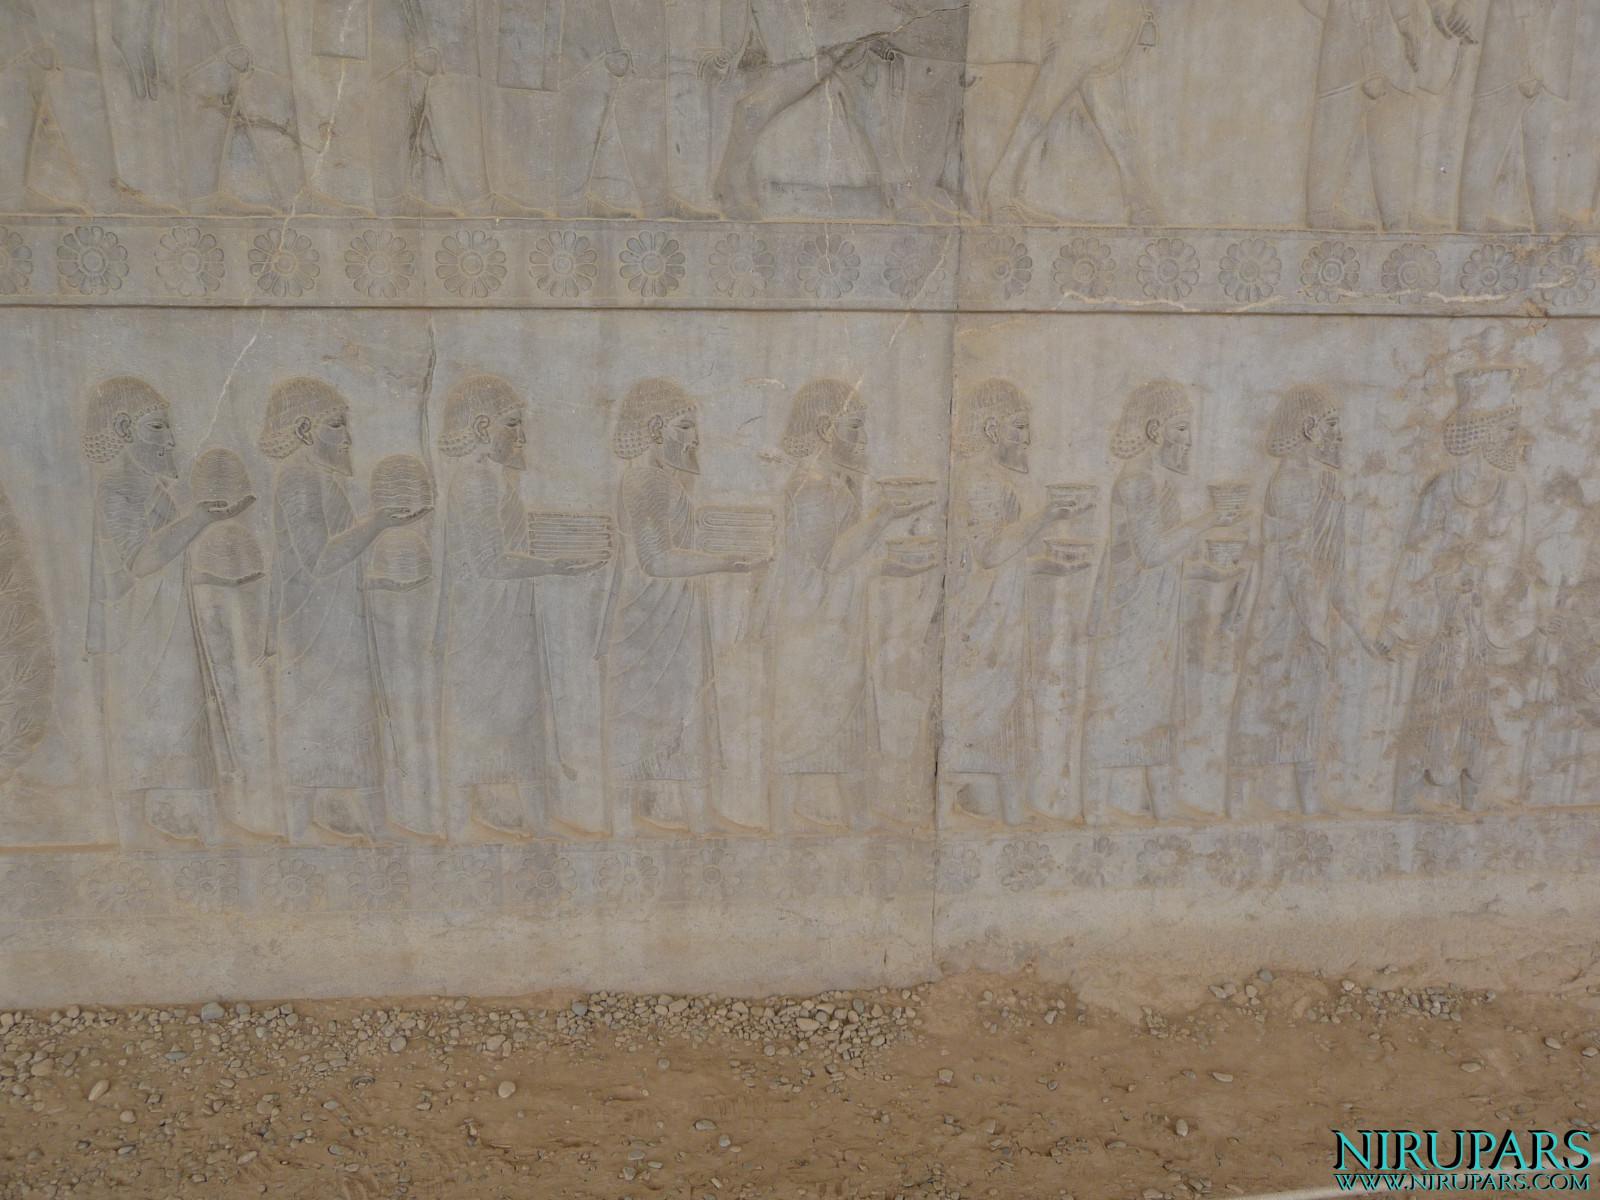 Persepolis - Apadana - East Portico - Delegation Ionia